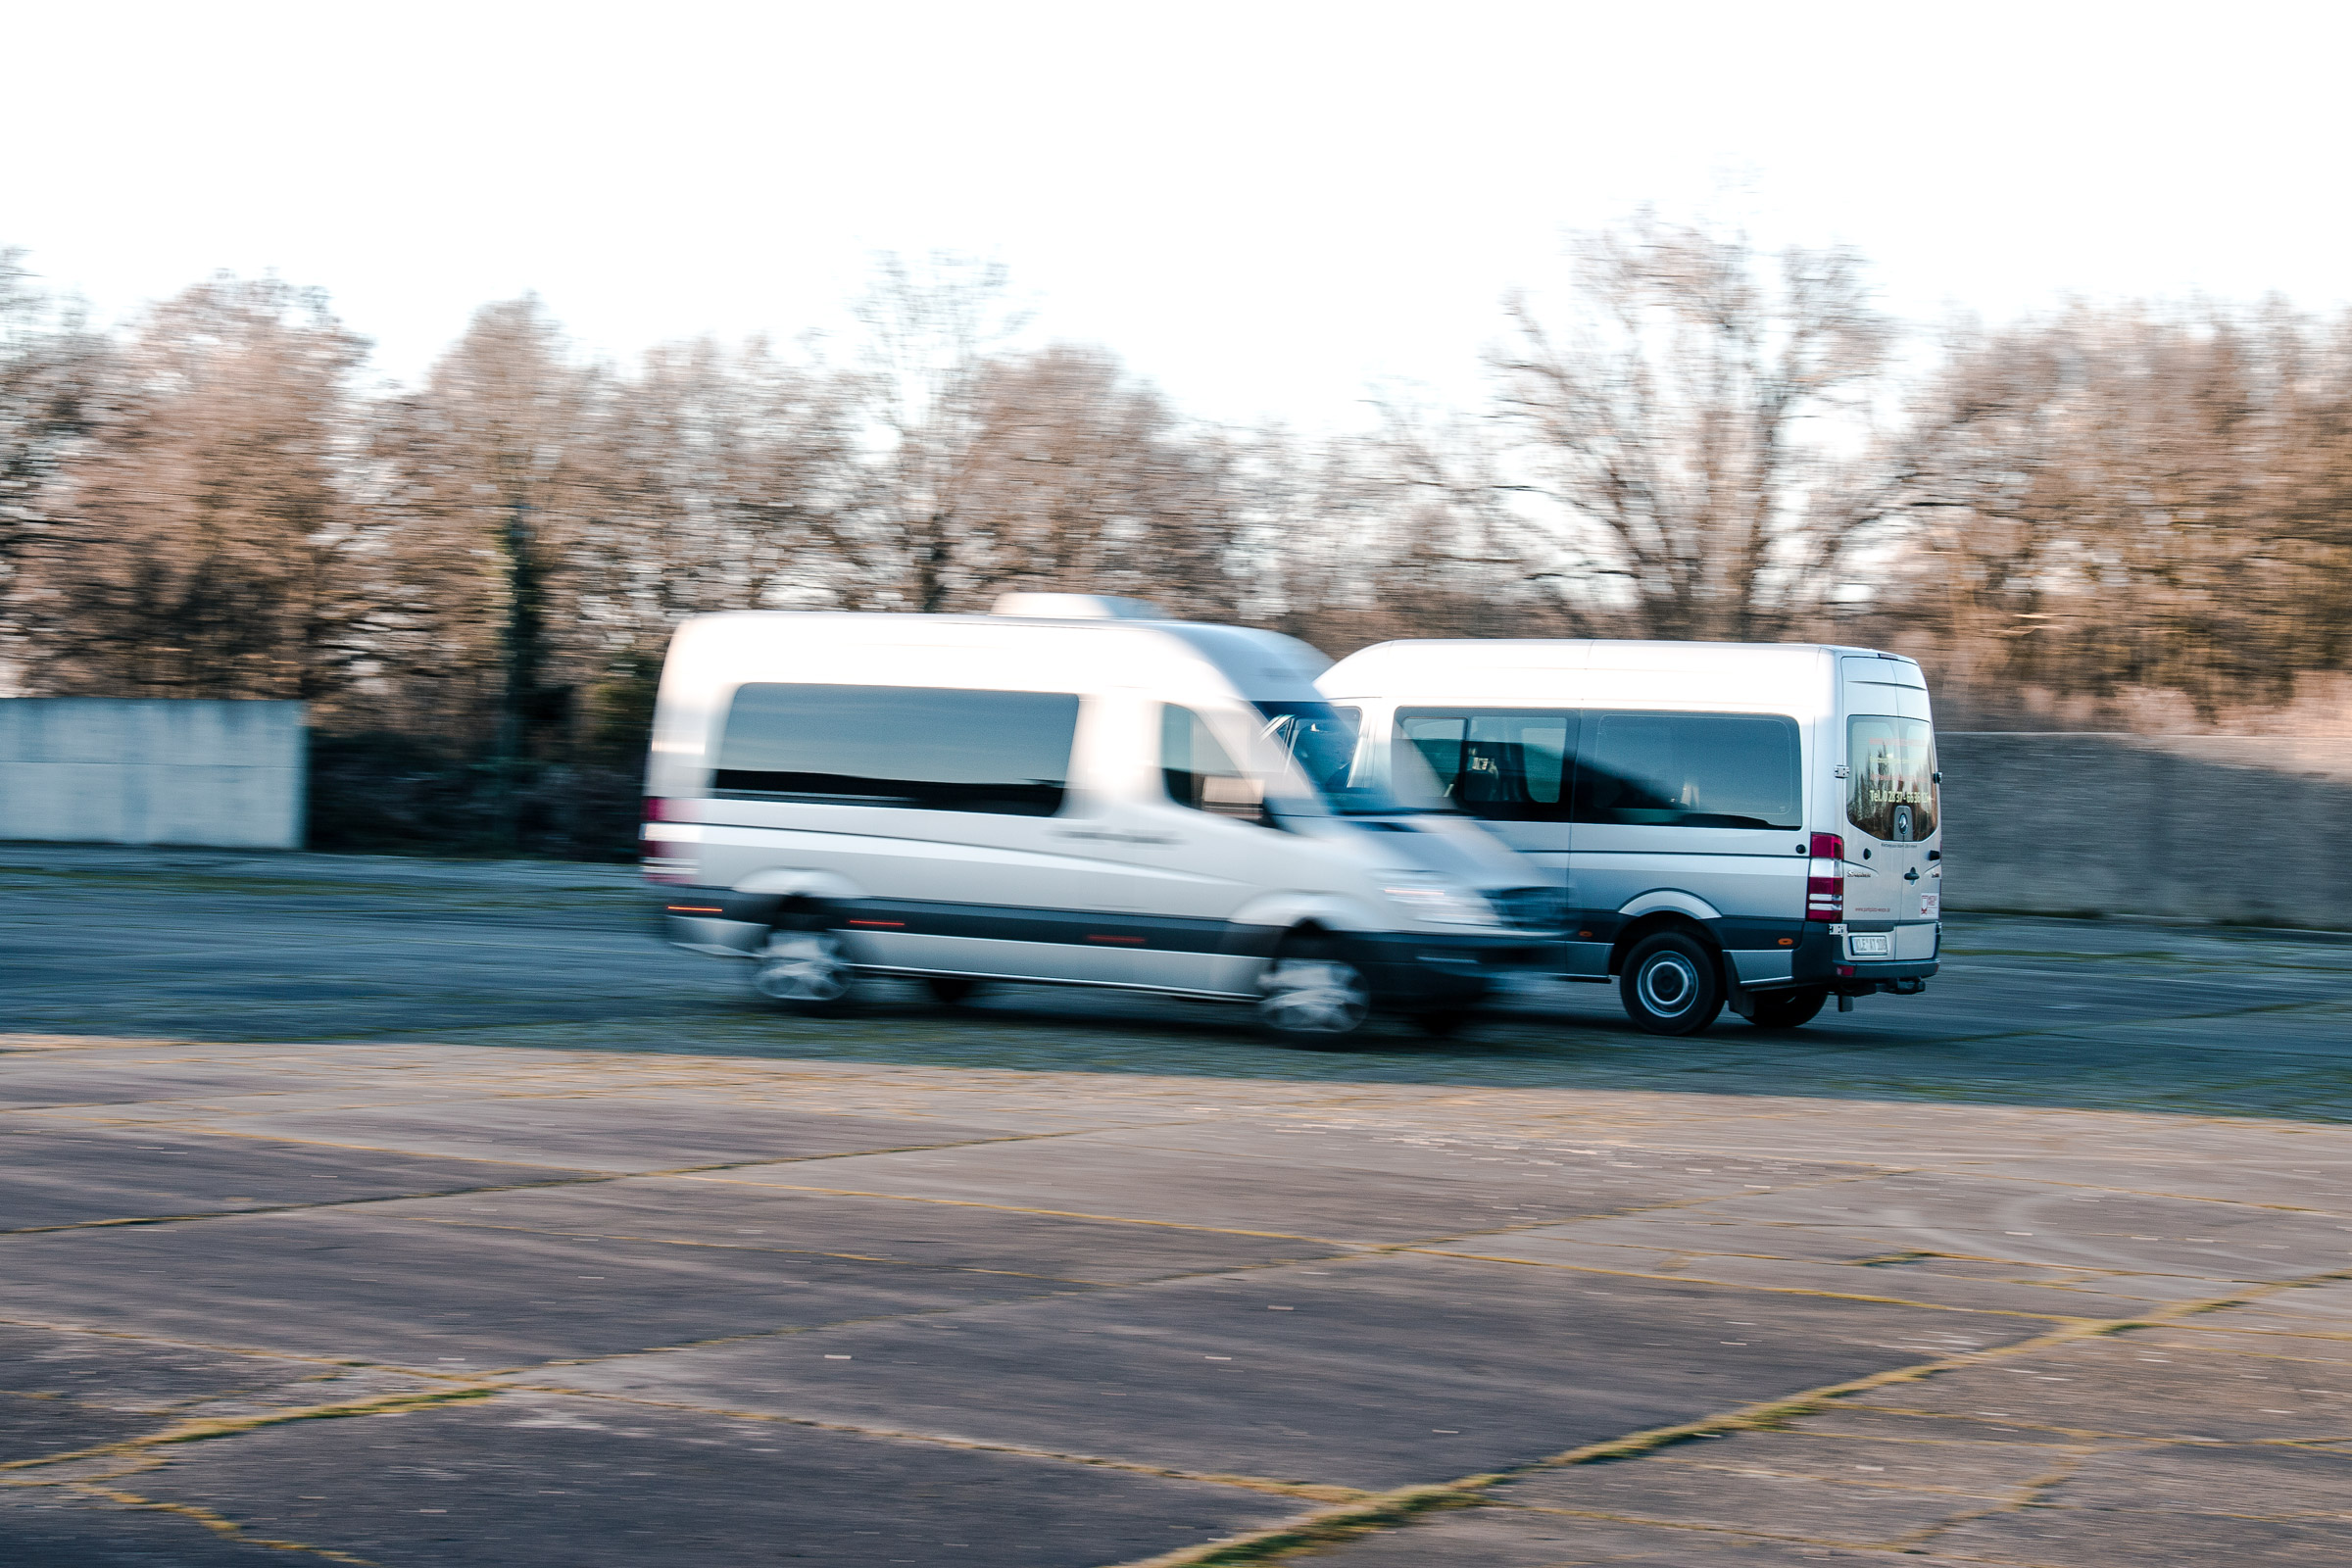 Mietbus Weeze Fotografie